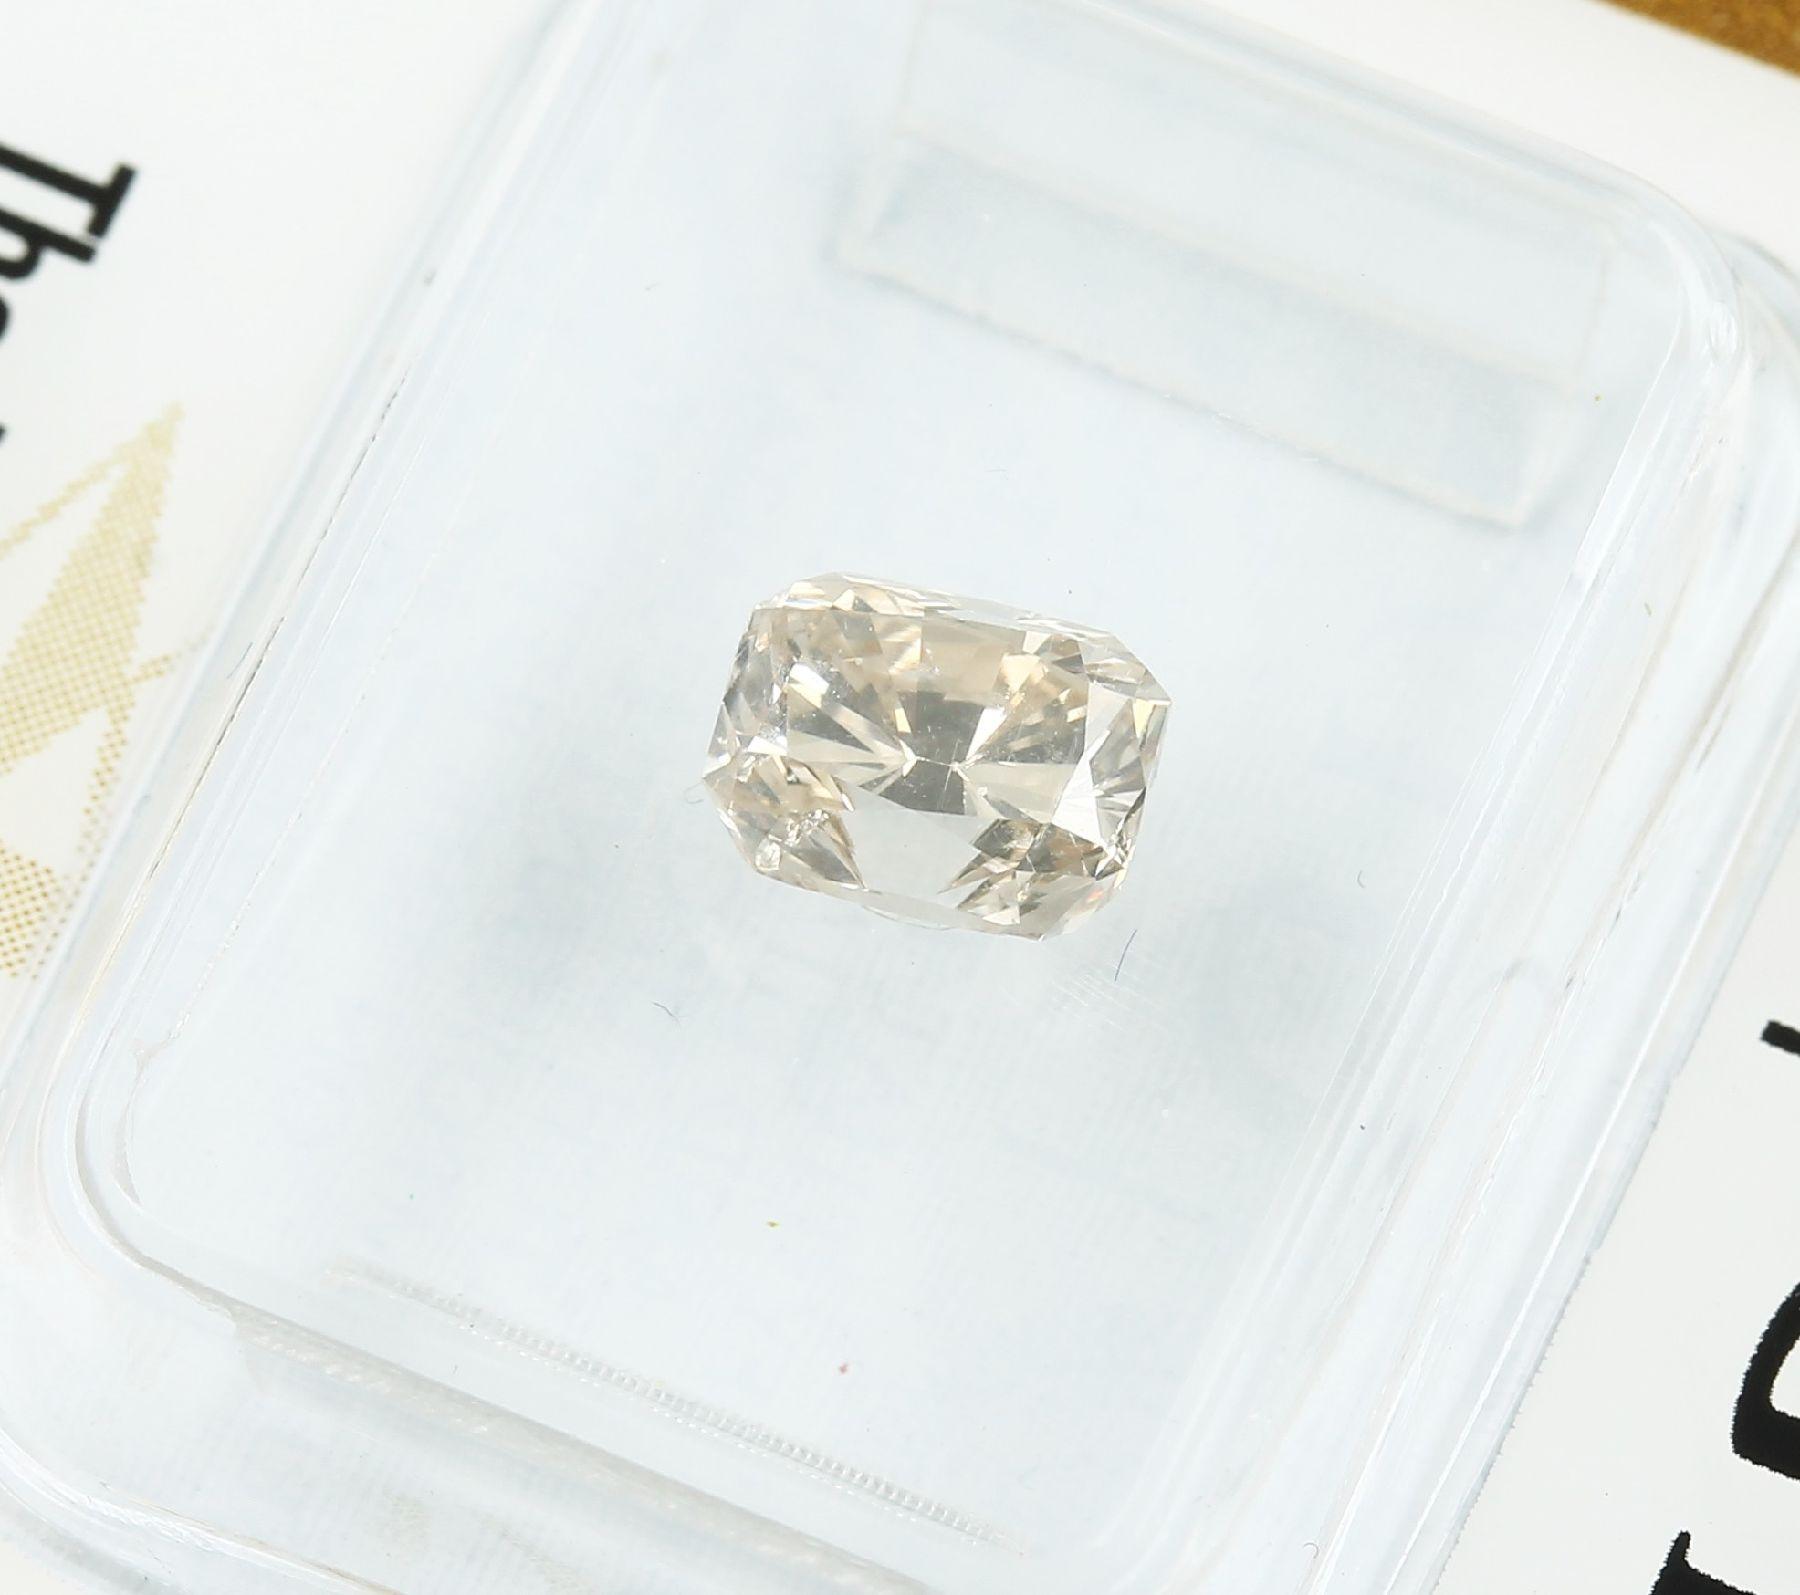 Loser Diamant, 0.91 ct Natural fancy light yellow-brown, rechteckig facett., 5.99 x 4.72 x 3.95 - Bild 3 aus 3